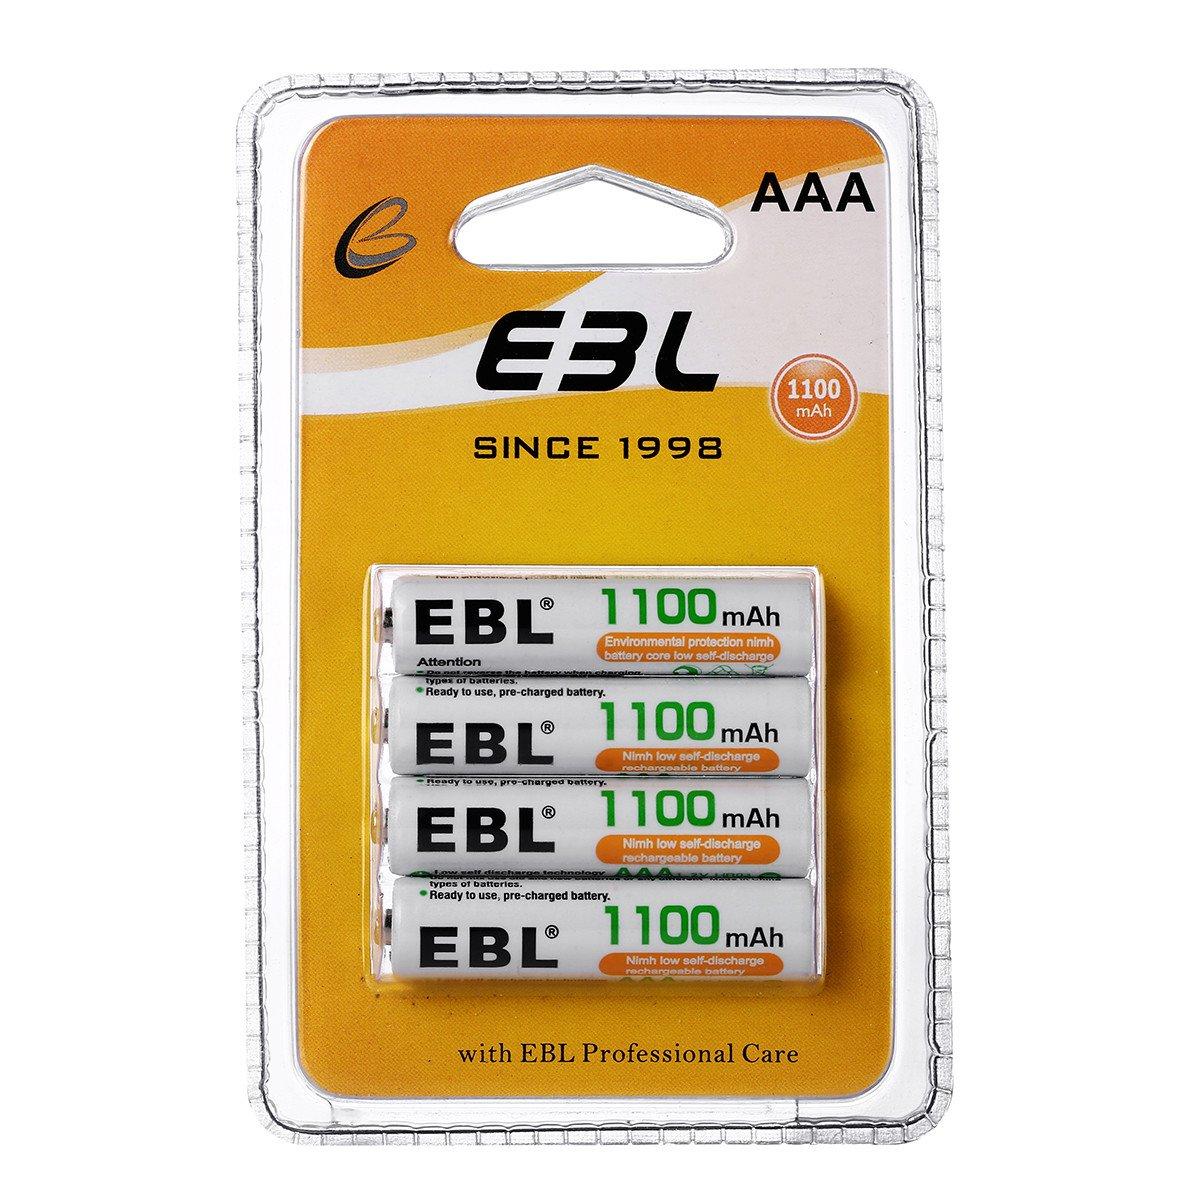 EBL 4 Stück 1100mAh NI-MH Akkus AAA Mirco Wiederaufladbare Akkus